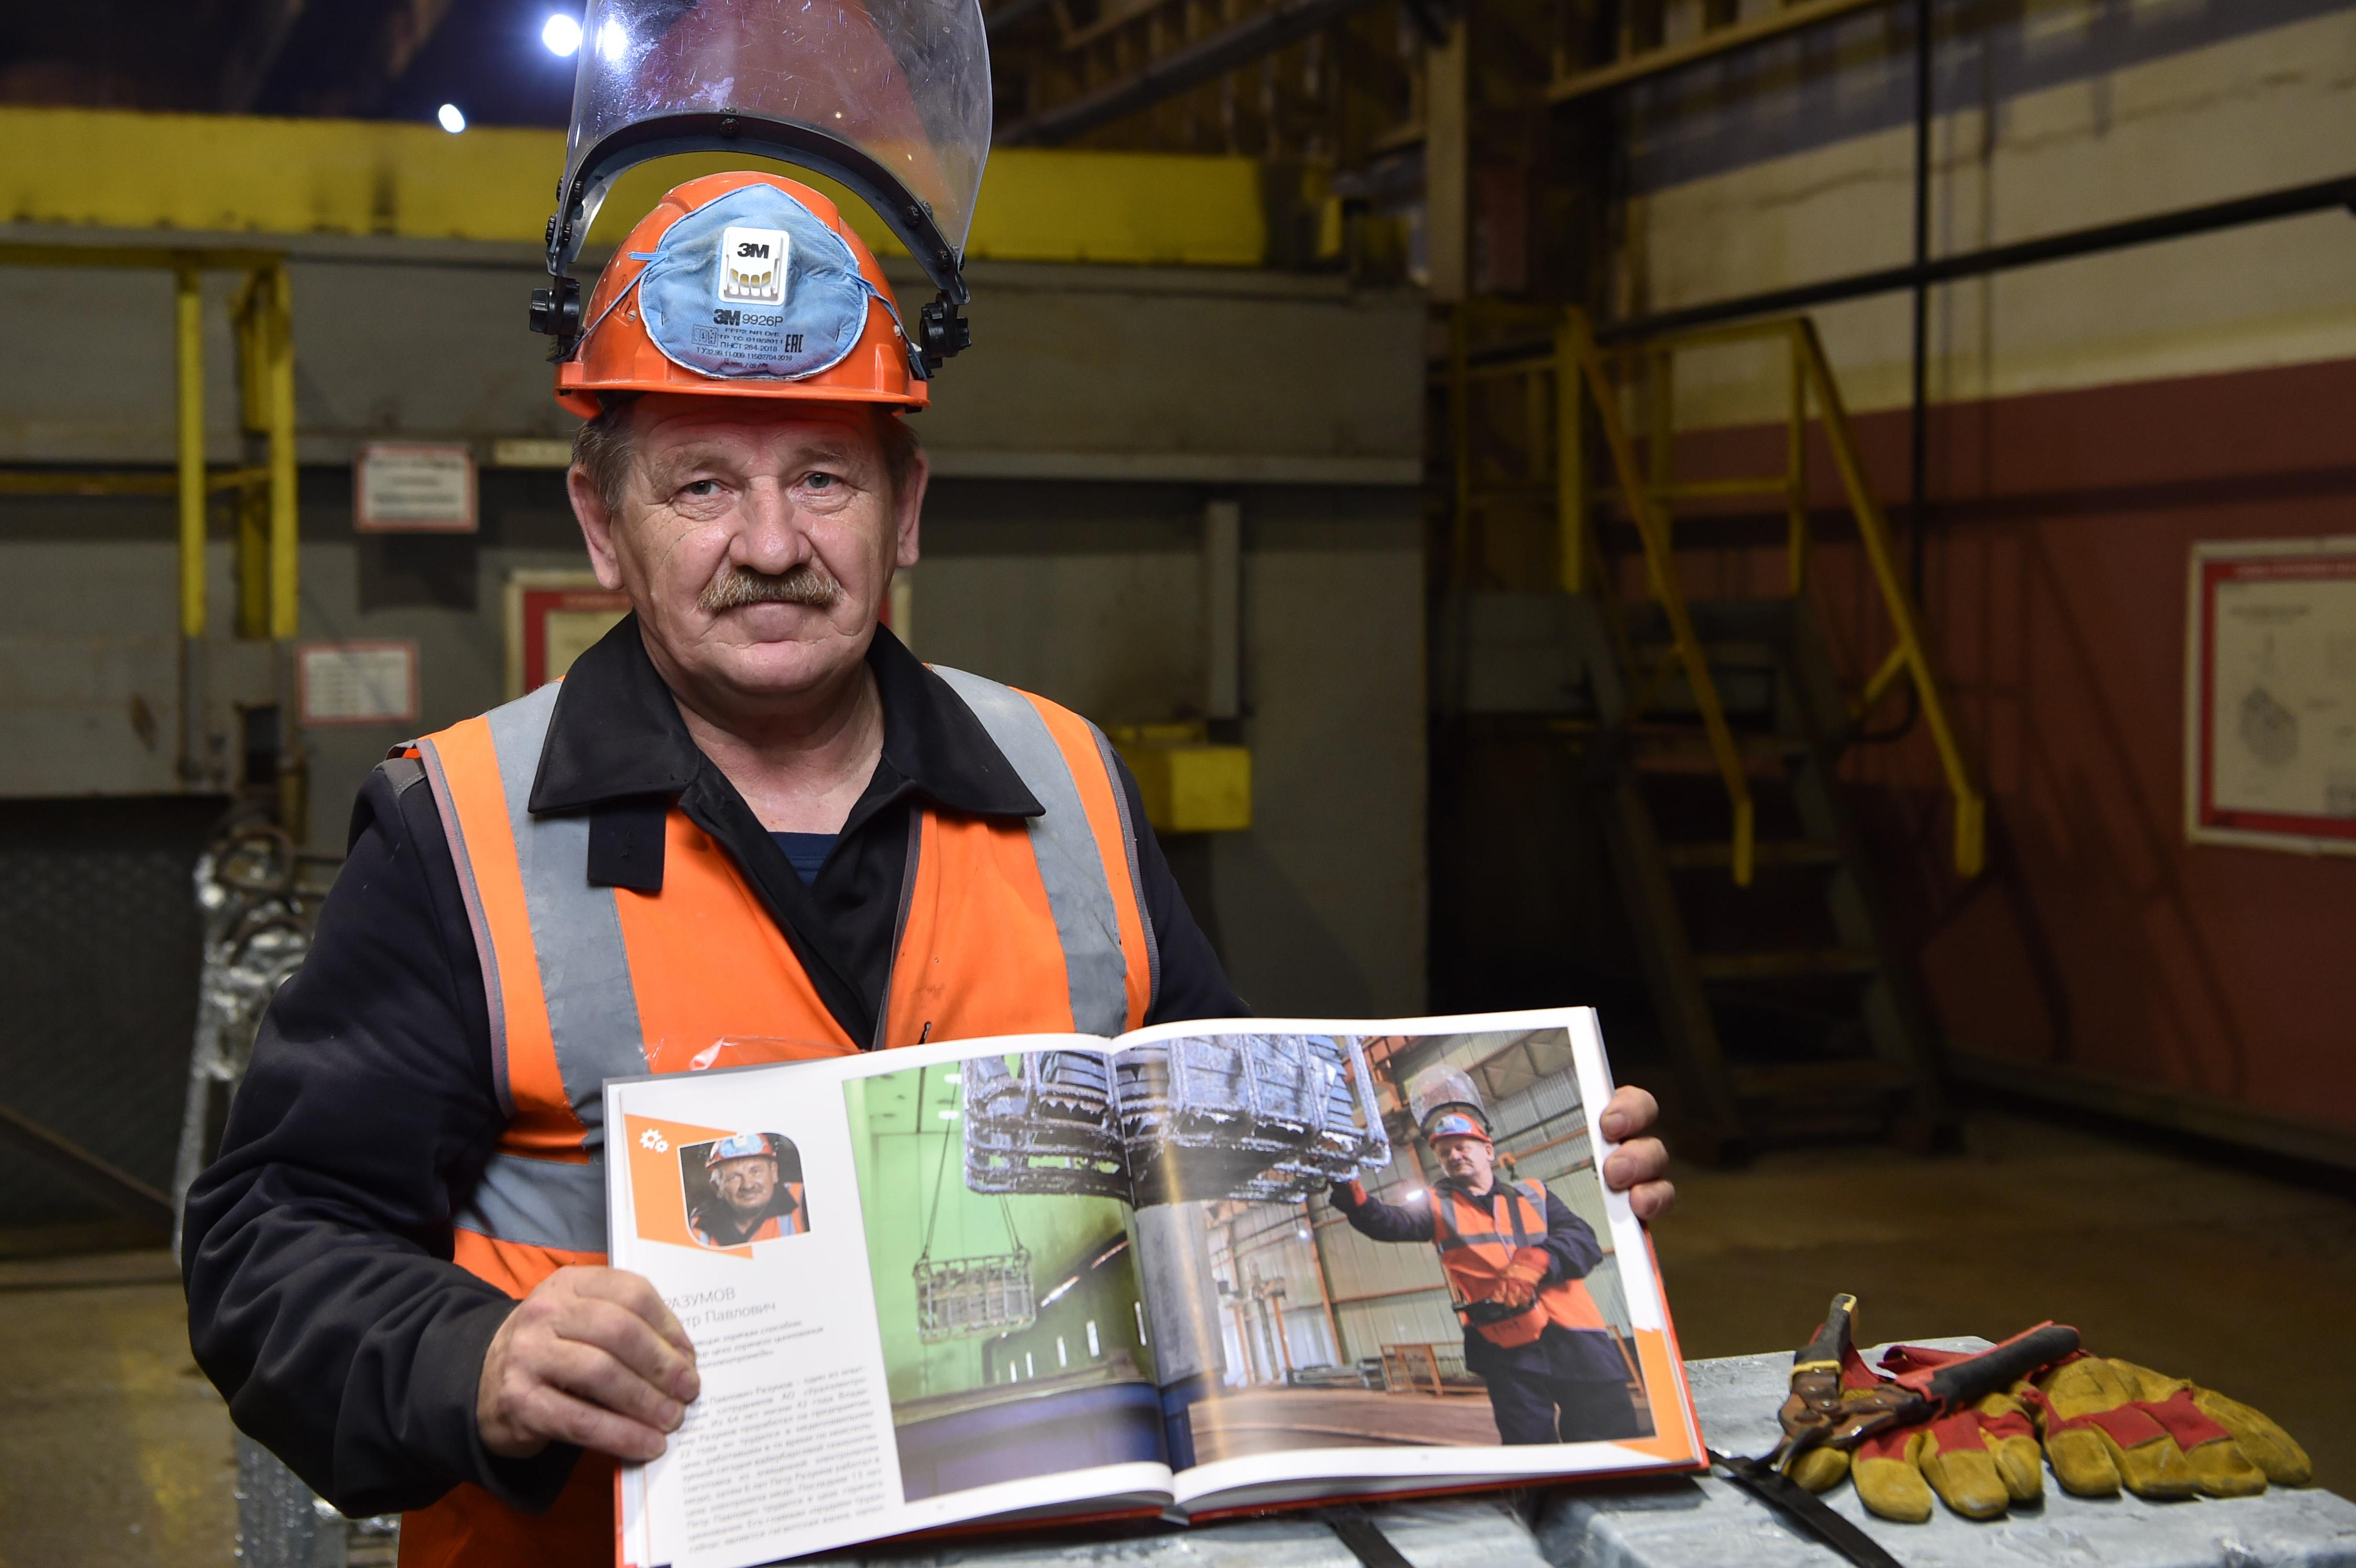 Книга о сотрудниках УГМК признана лучшим корпоративным изданием